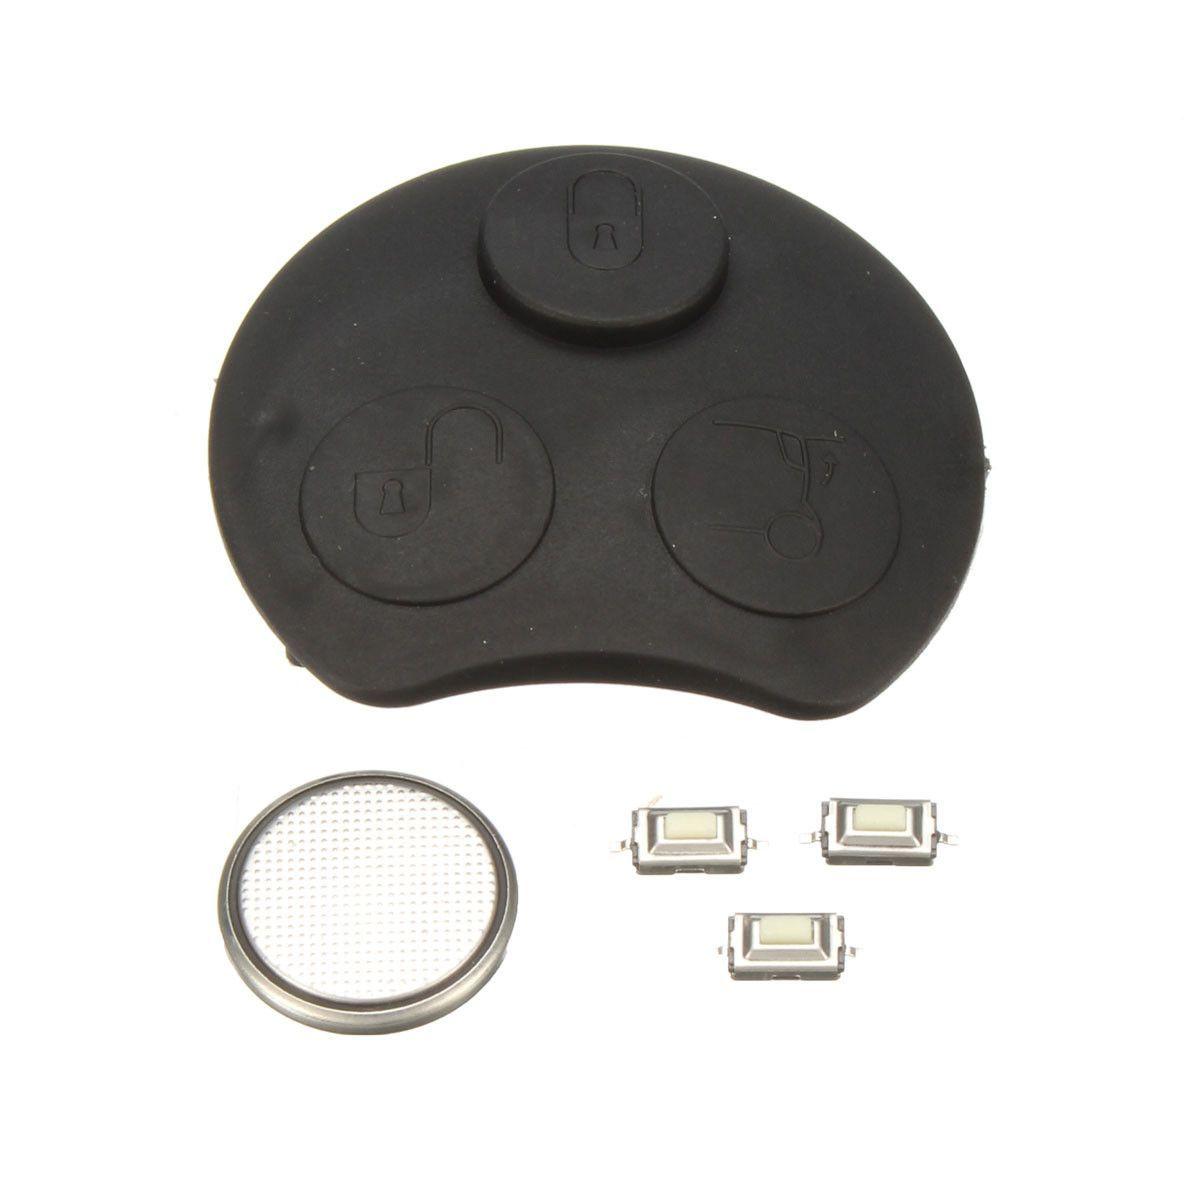 3 Button Car Remote Key Fob Case Repair Kit Rubber Gasket Battery